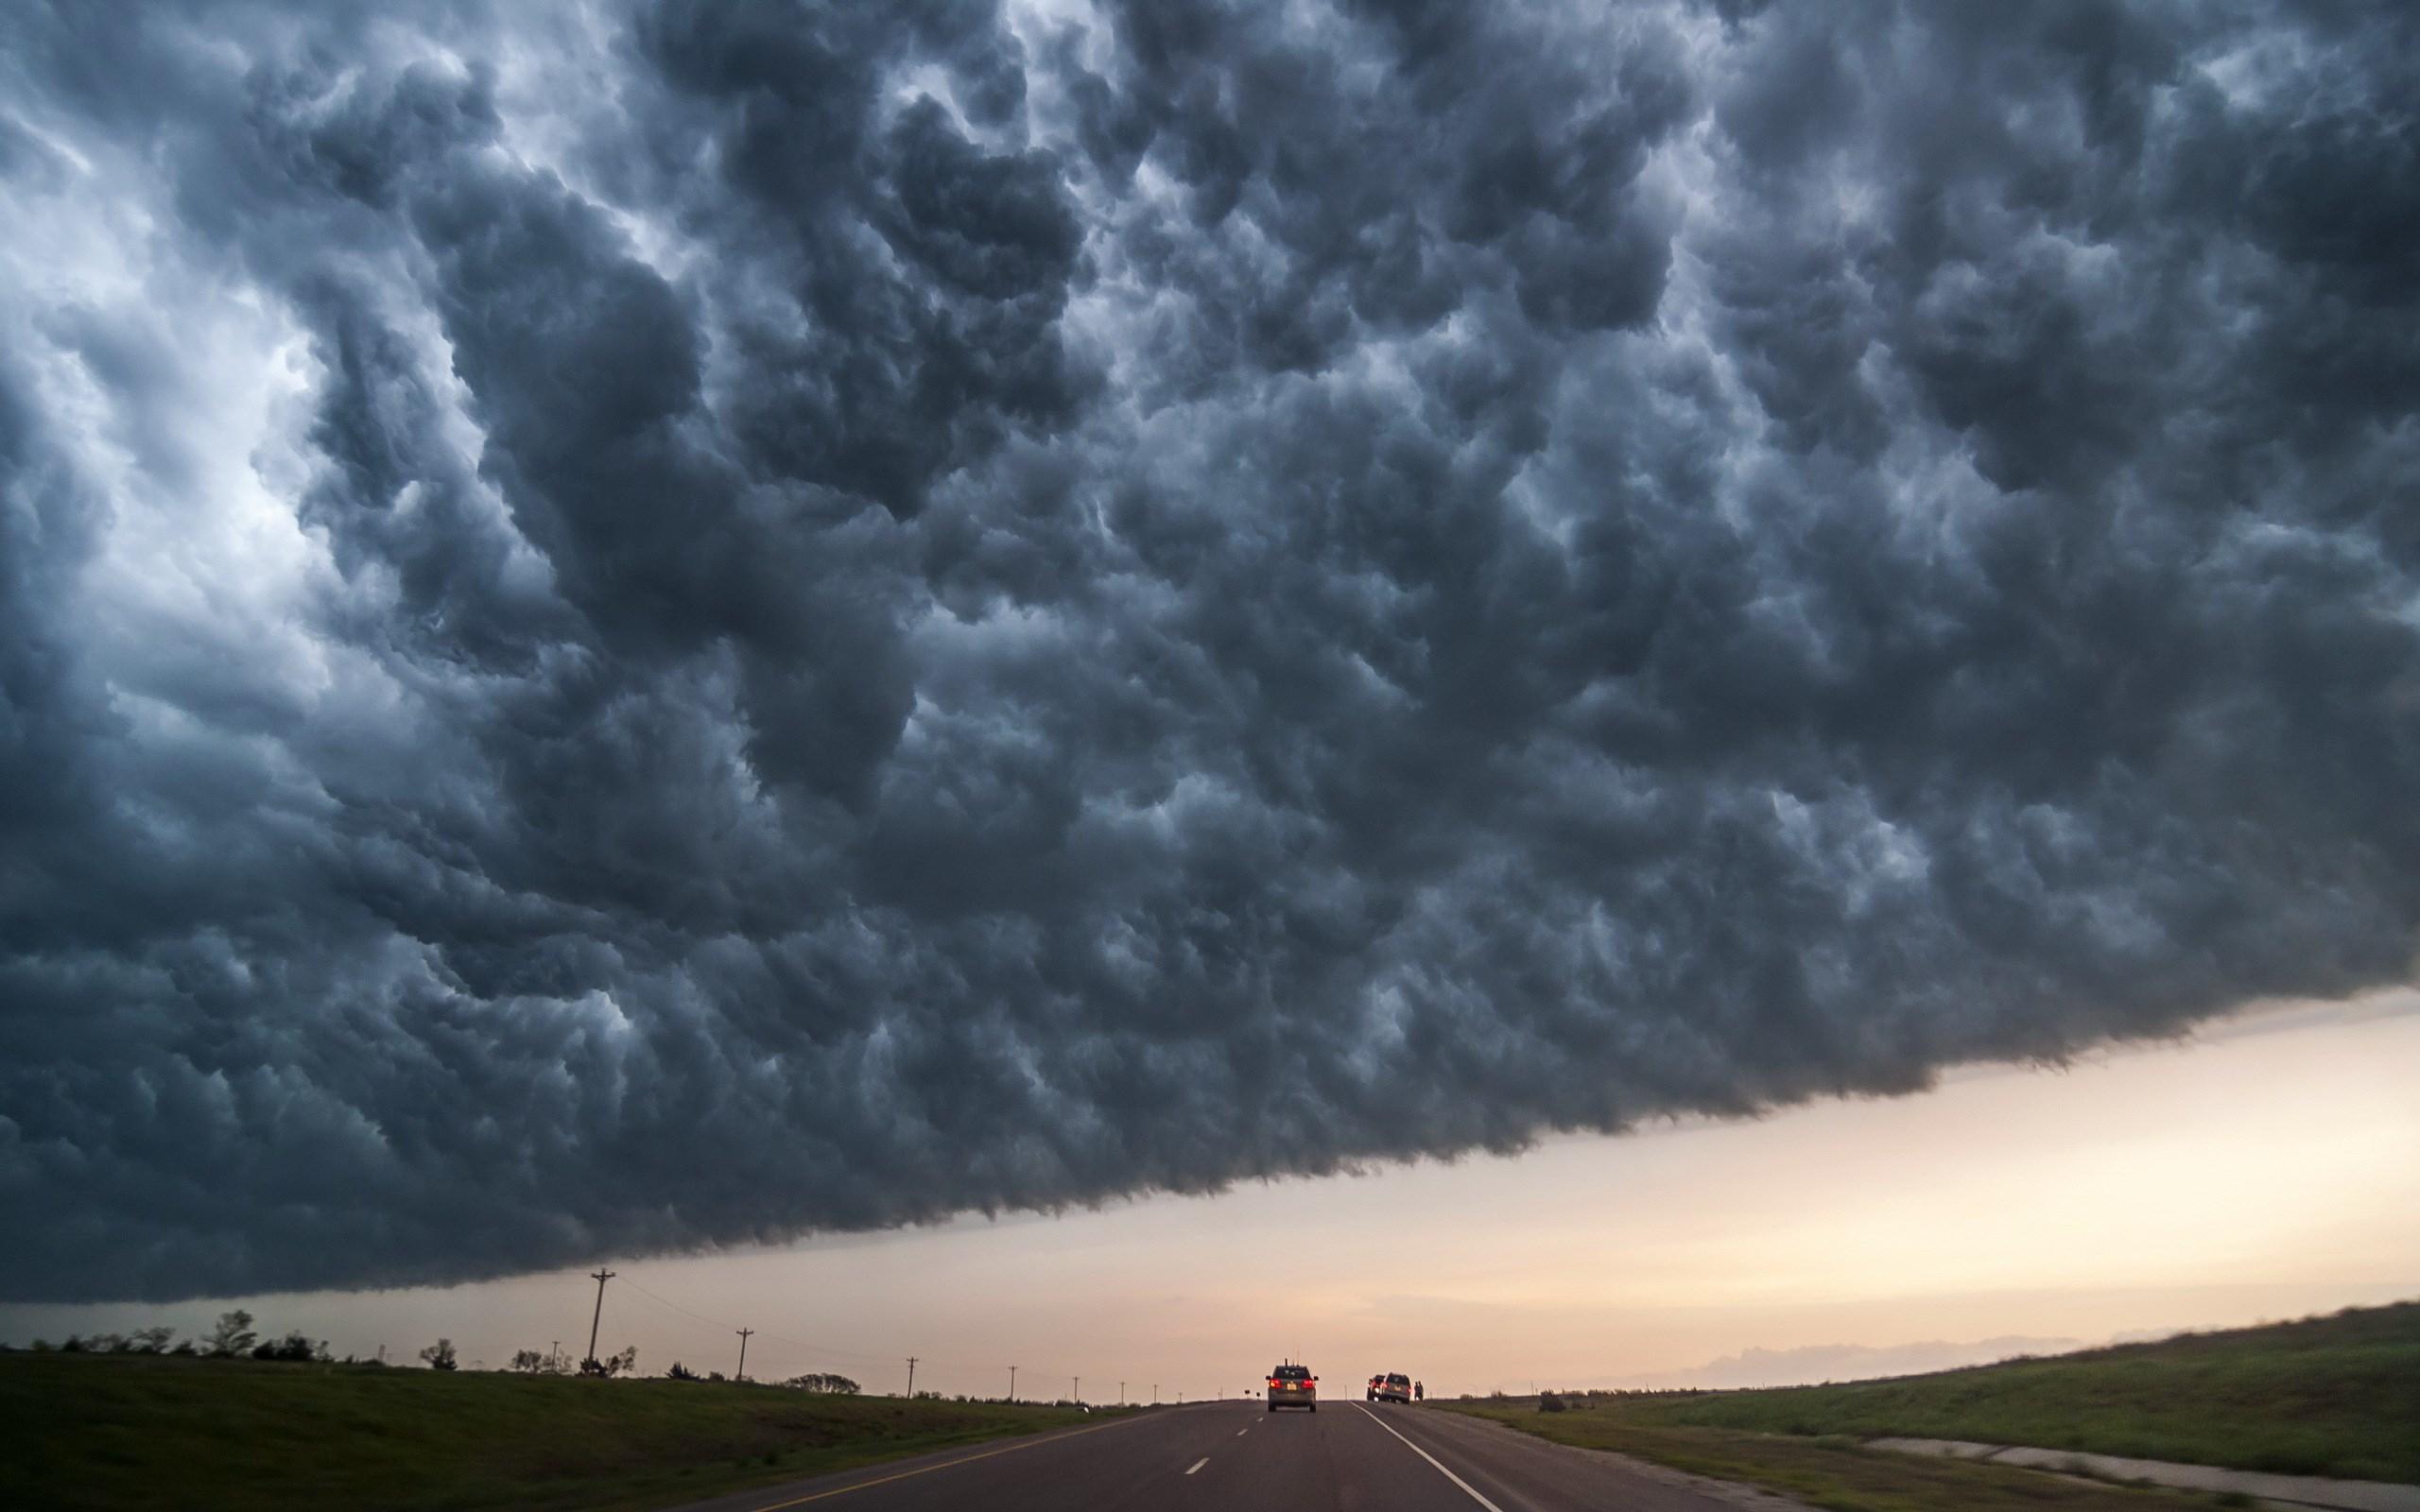 Oppo 3d Wallpaper Road Sky Landscape Clouds Storm Wallpaper 2560x1600